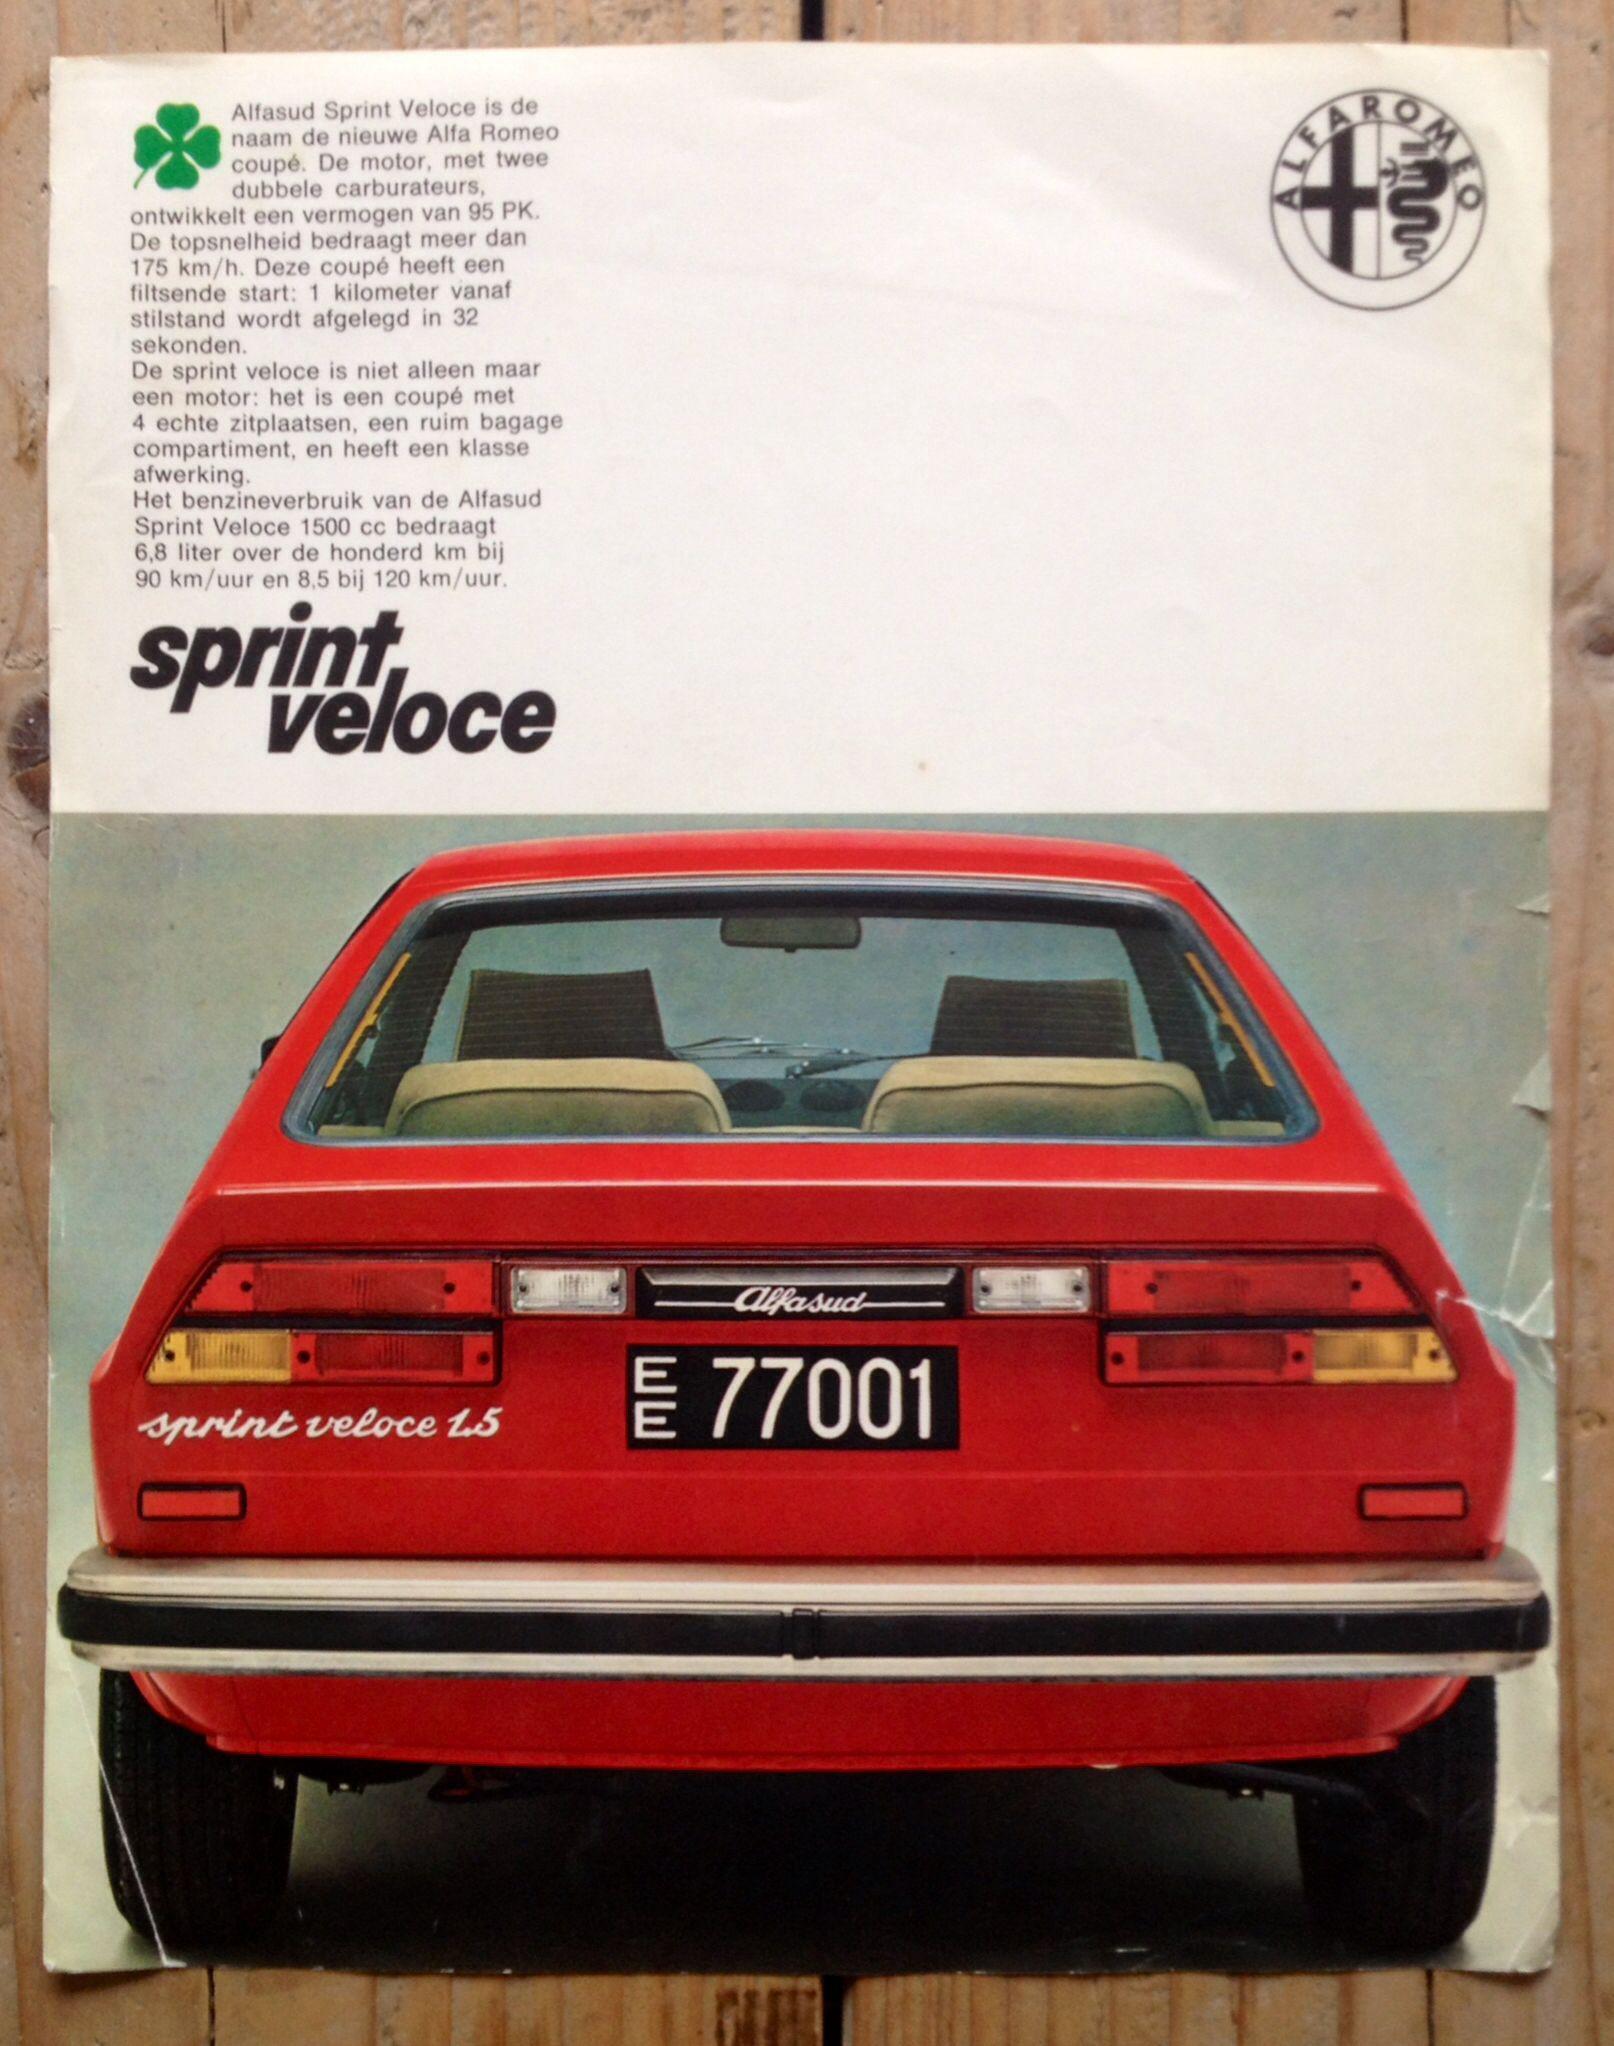 Alfa Romeo Sprint Veloce 15 Brochure 1979 Gt 1300 Junior Restoration Windscreen Wiper Motor 155